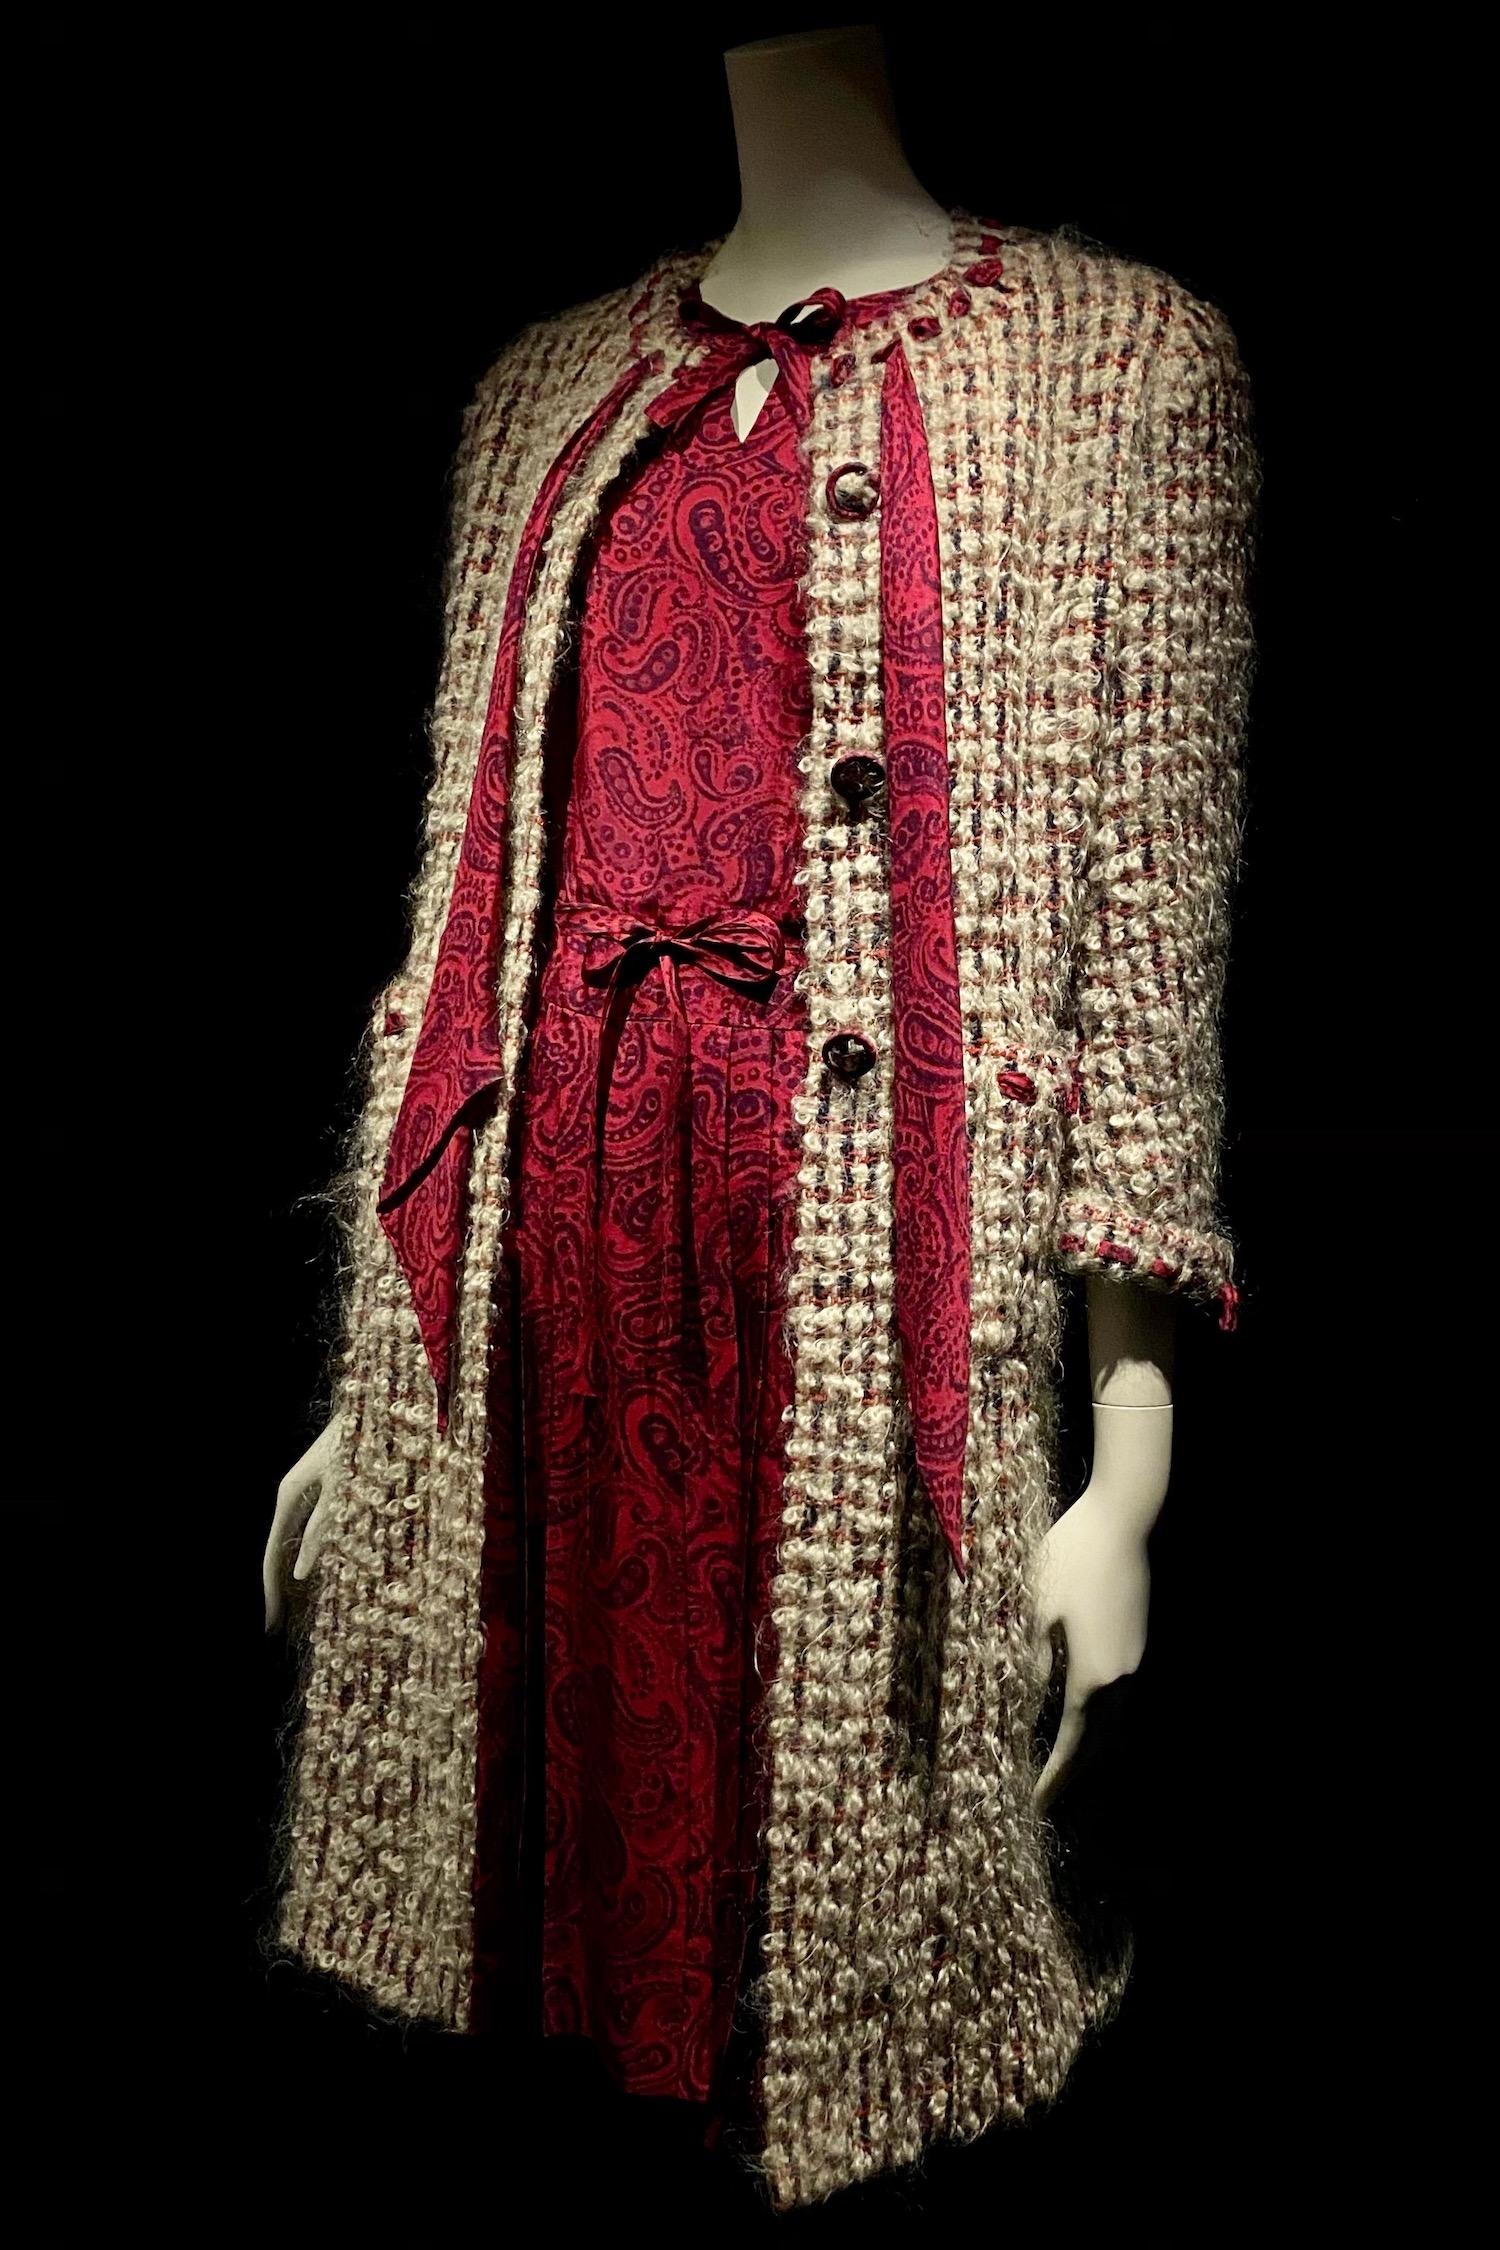 red paisley Gabrielle Chanel Fashion Manifesto exhibit